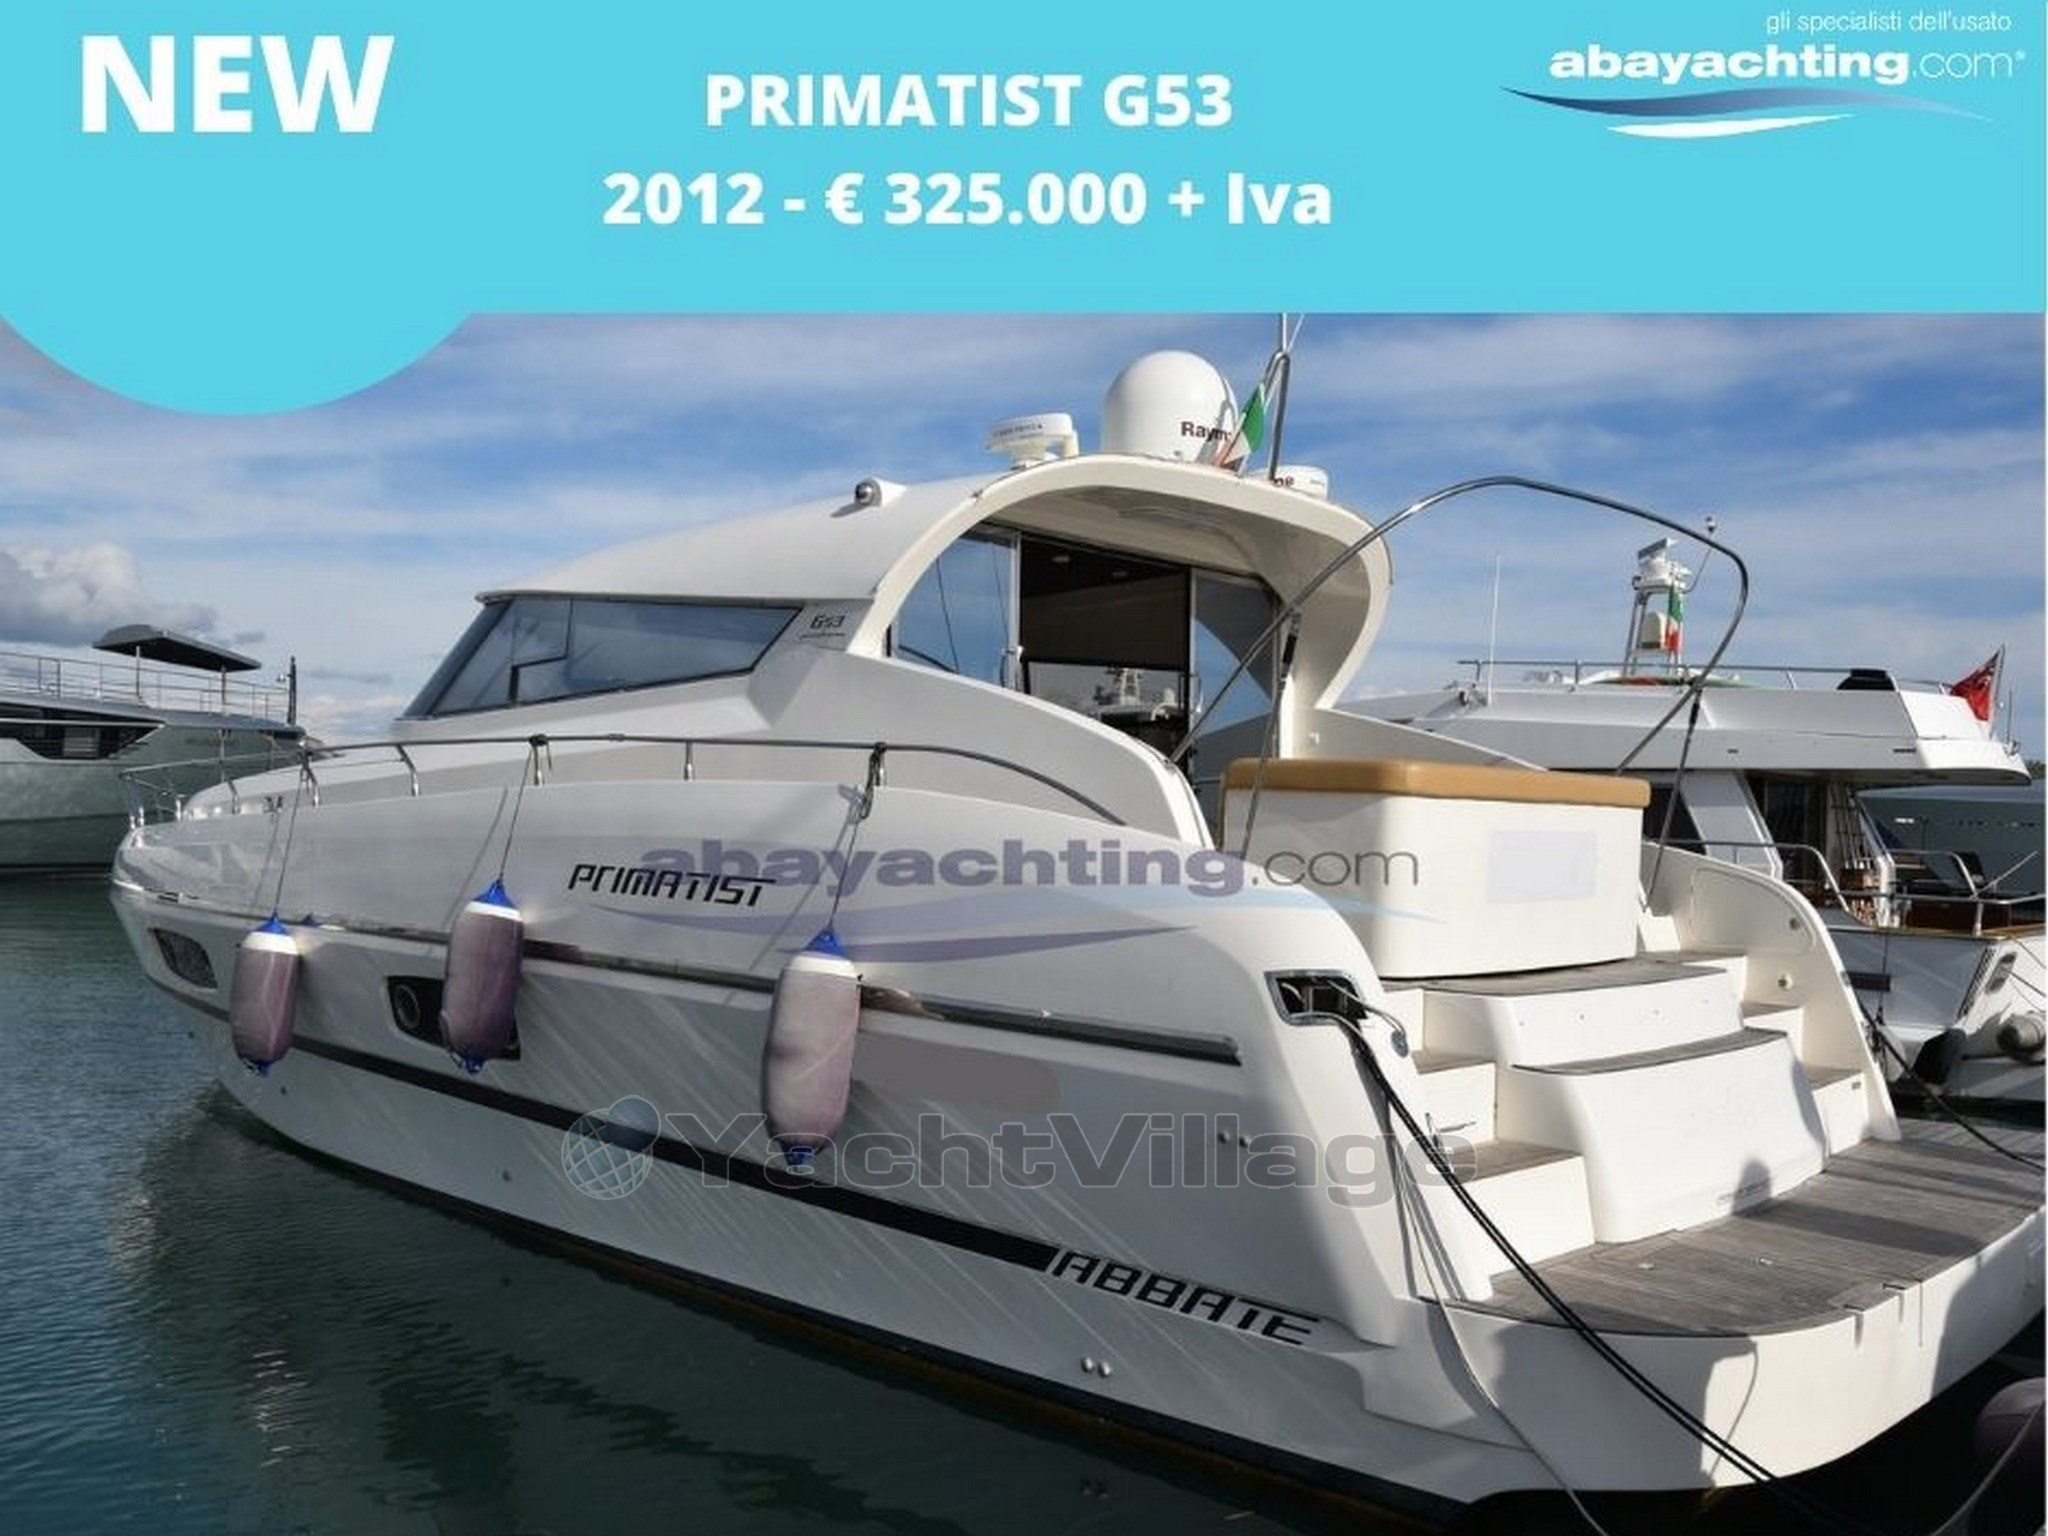 nUOVO ARRIVO PRIMATIST G53 Abayachting